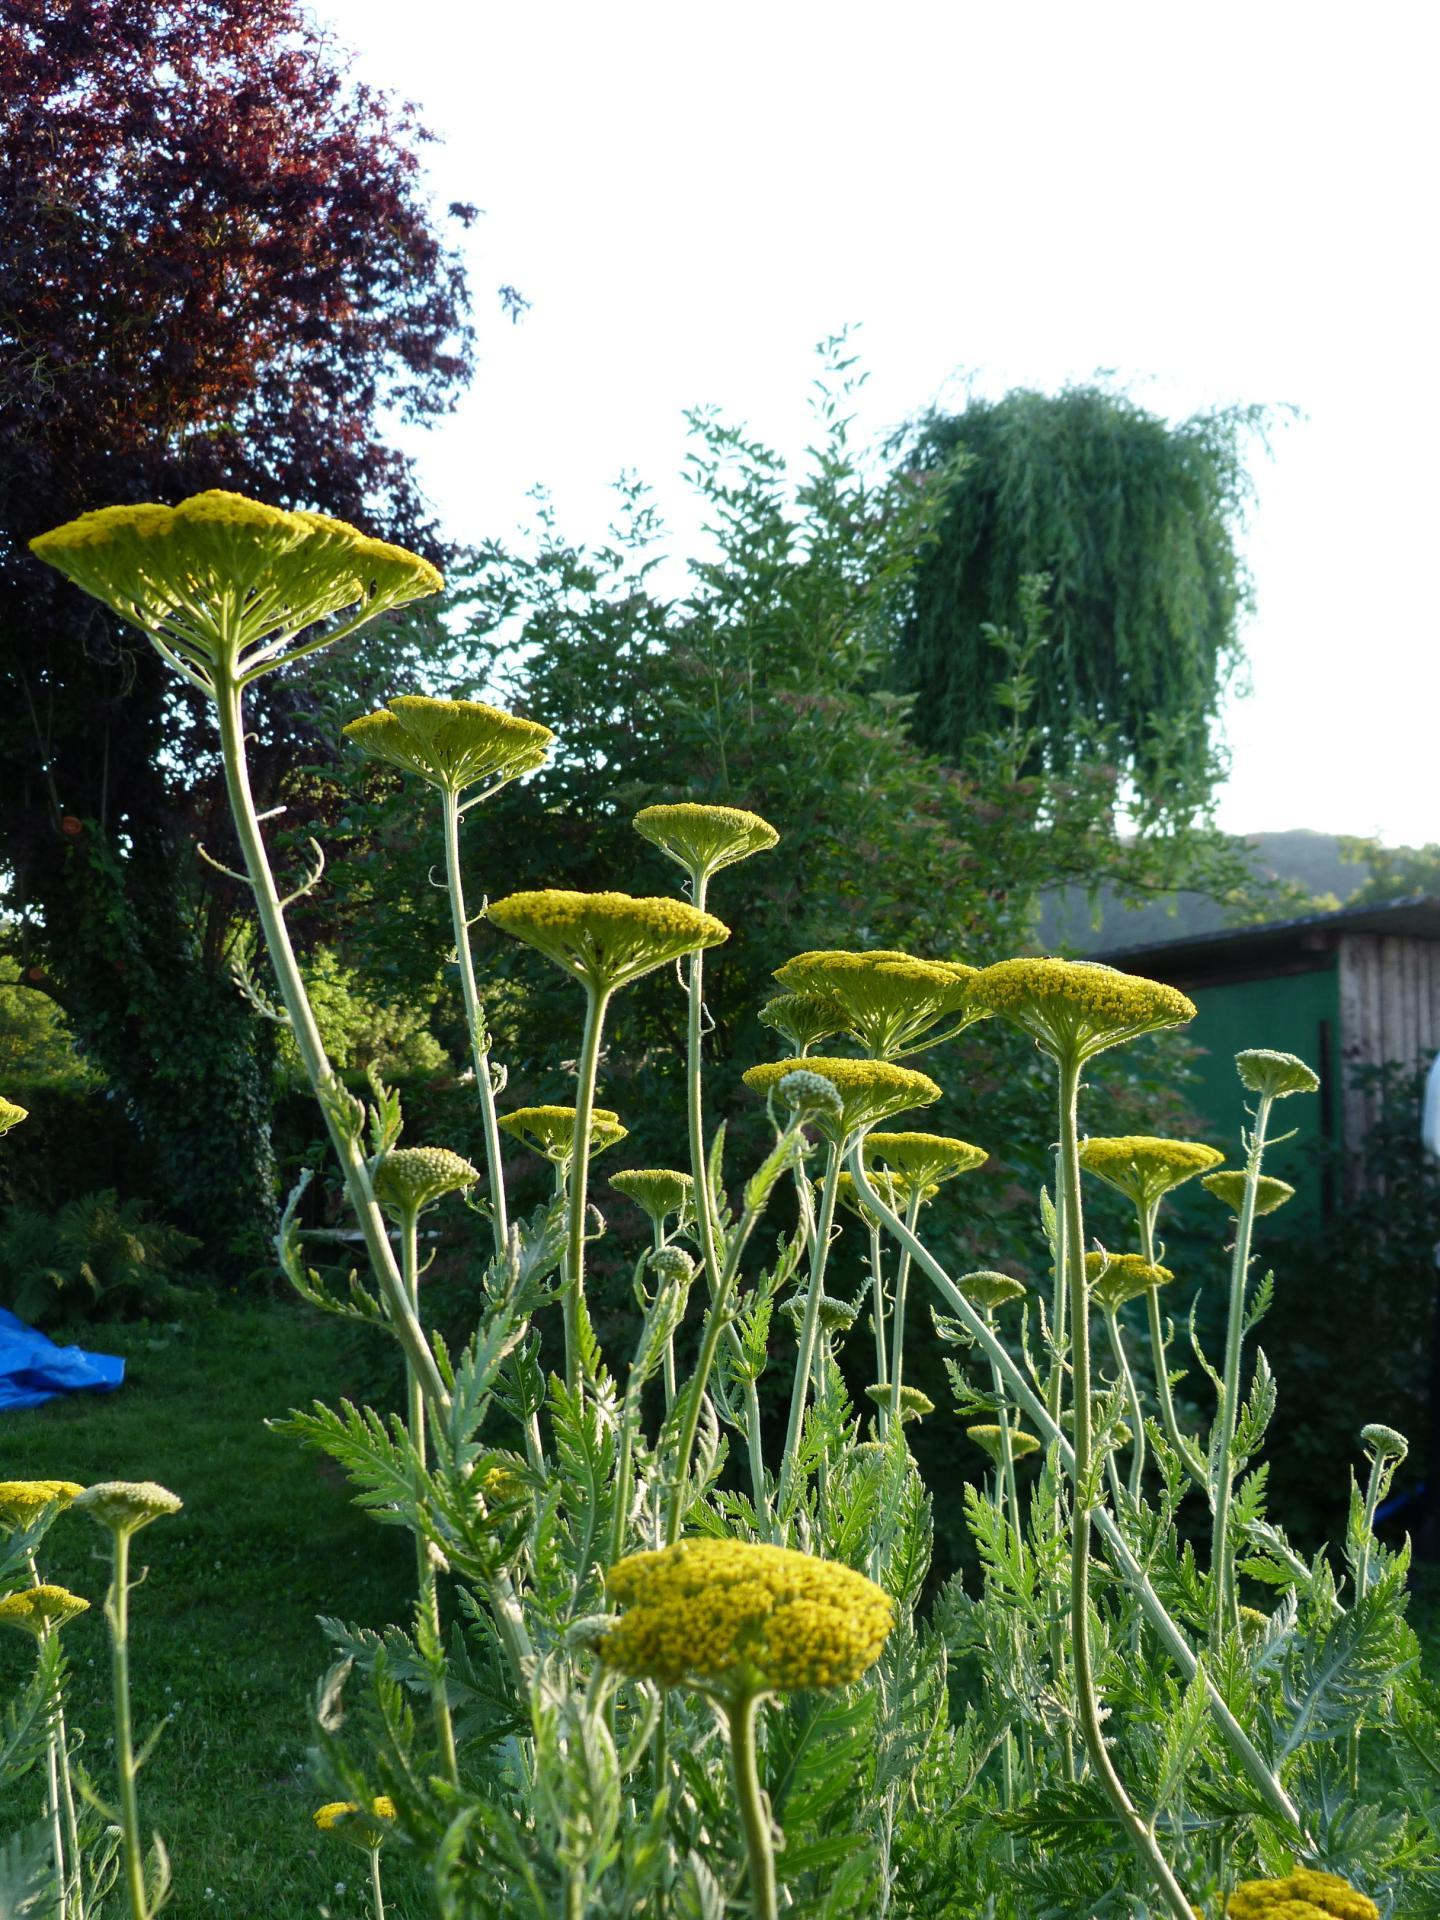 Jardinles especes achilleejaune 9